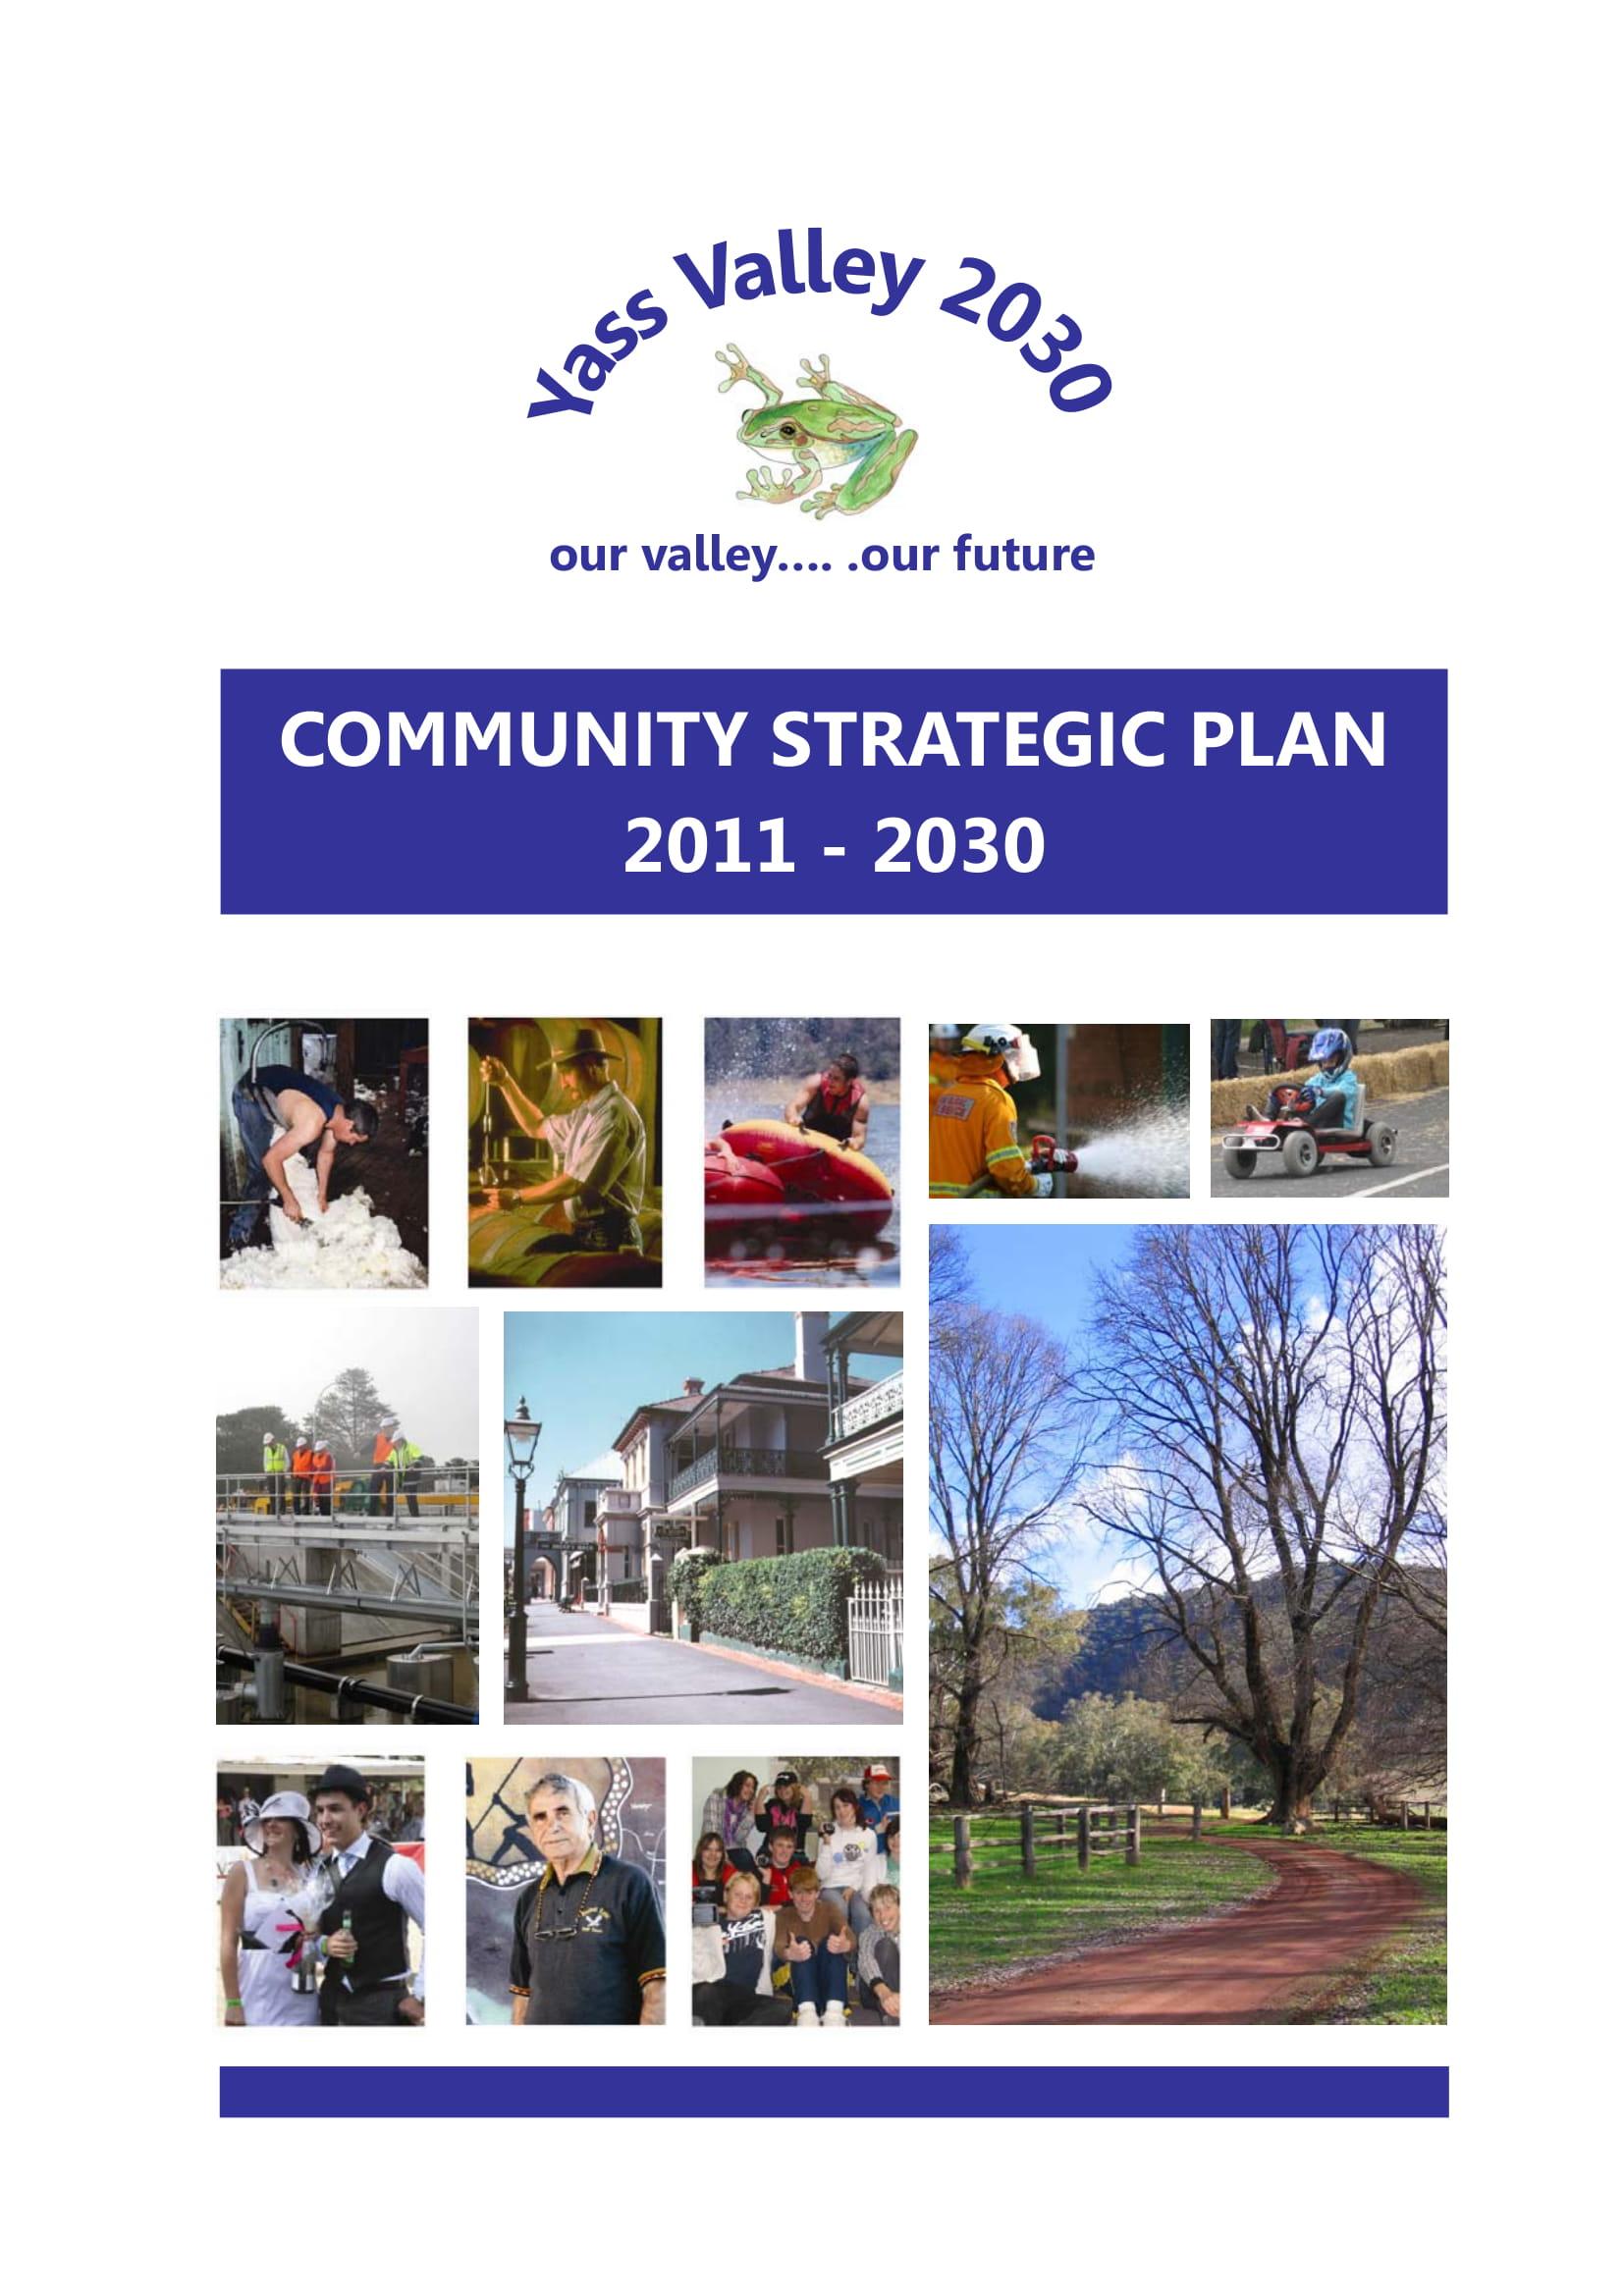 community strategic plan example 01